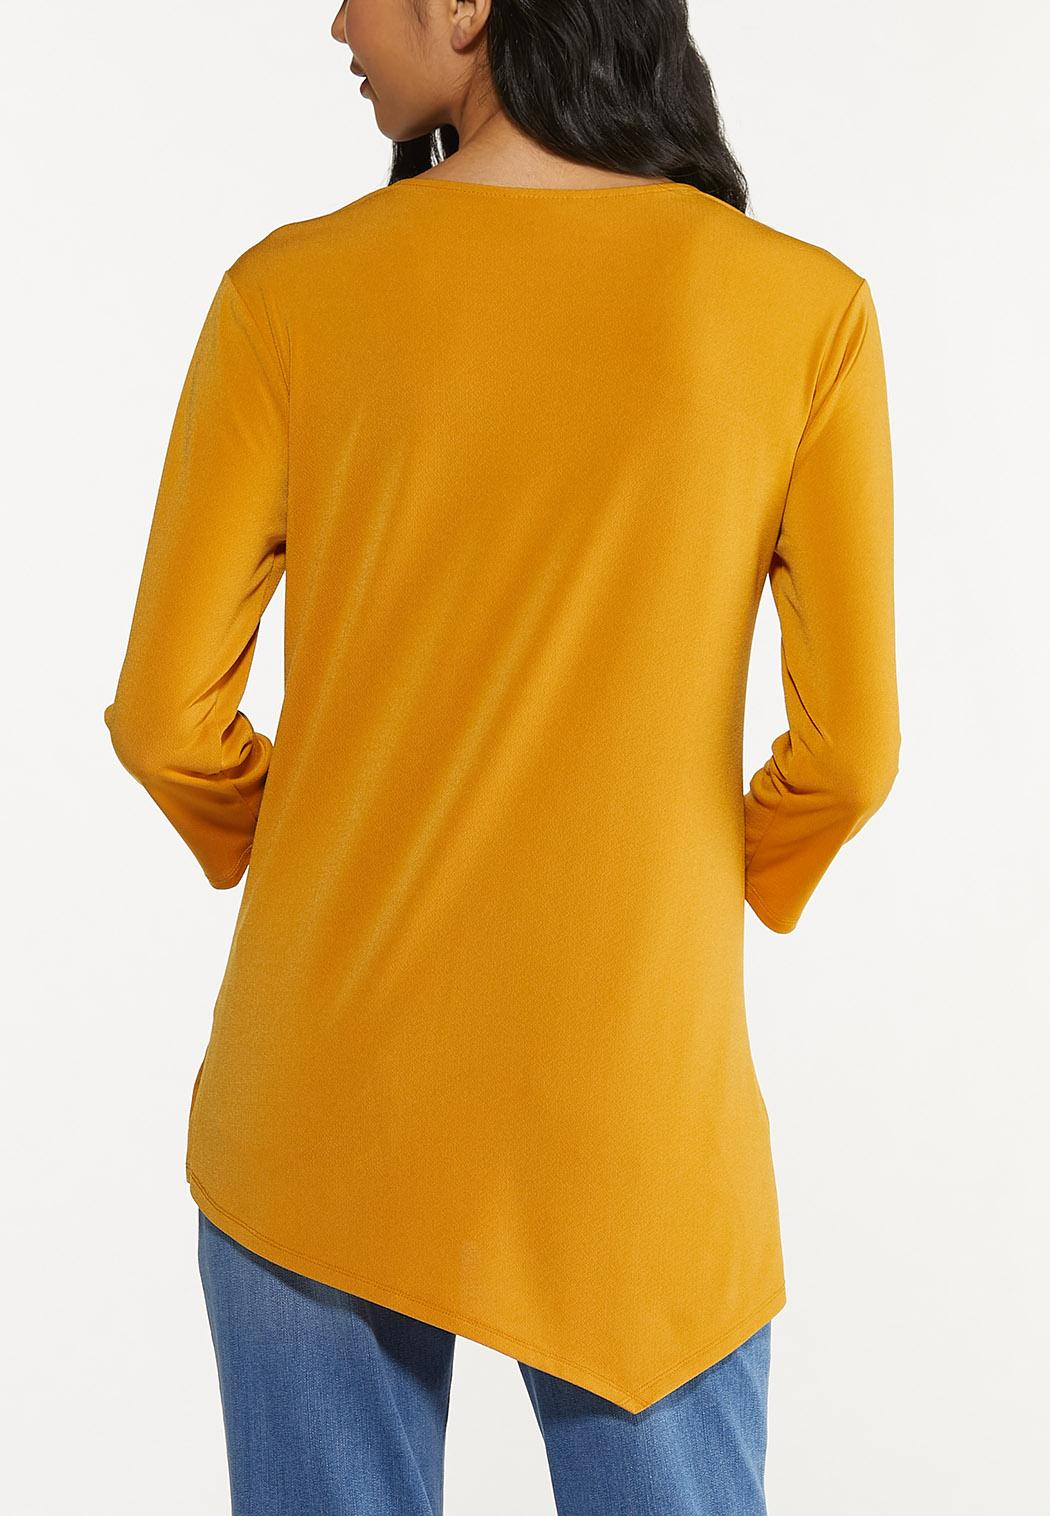 Gold Asymmetrical Top (Item #44650294)